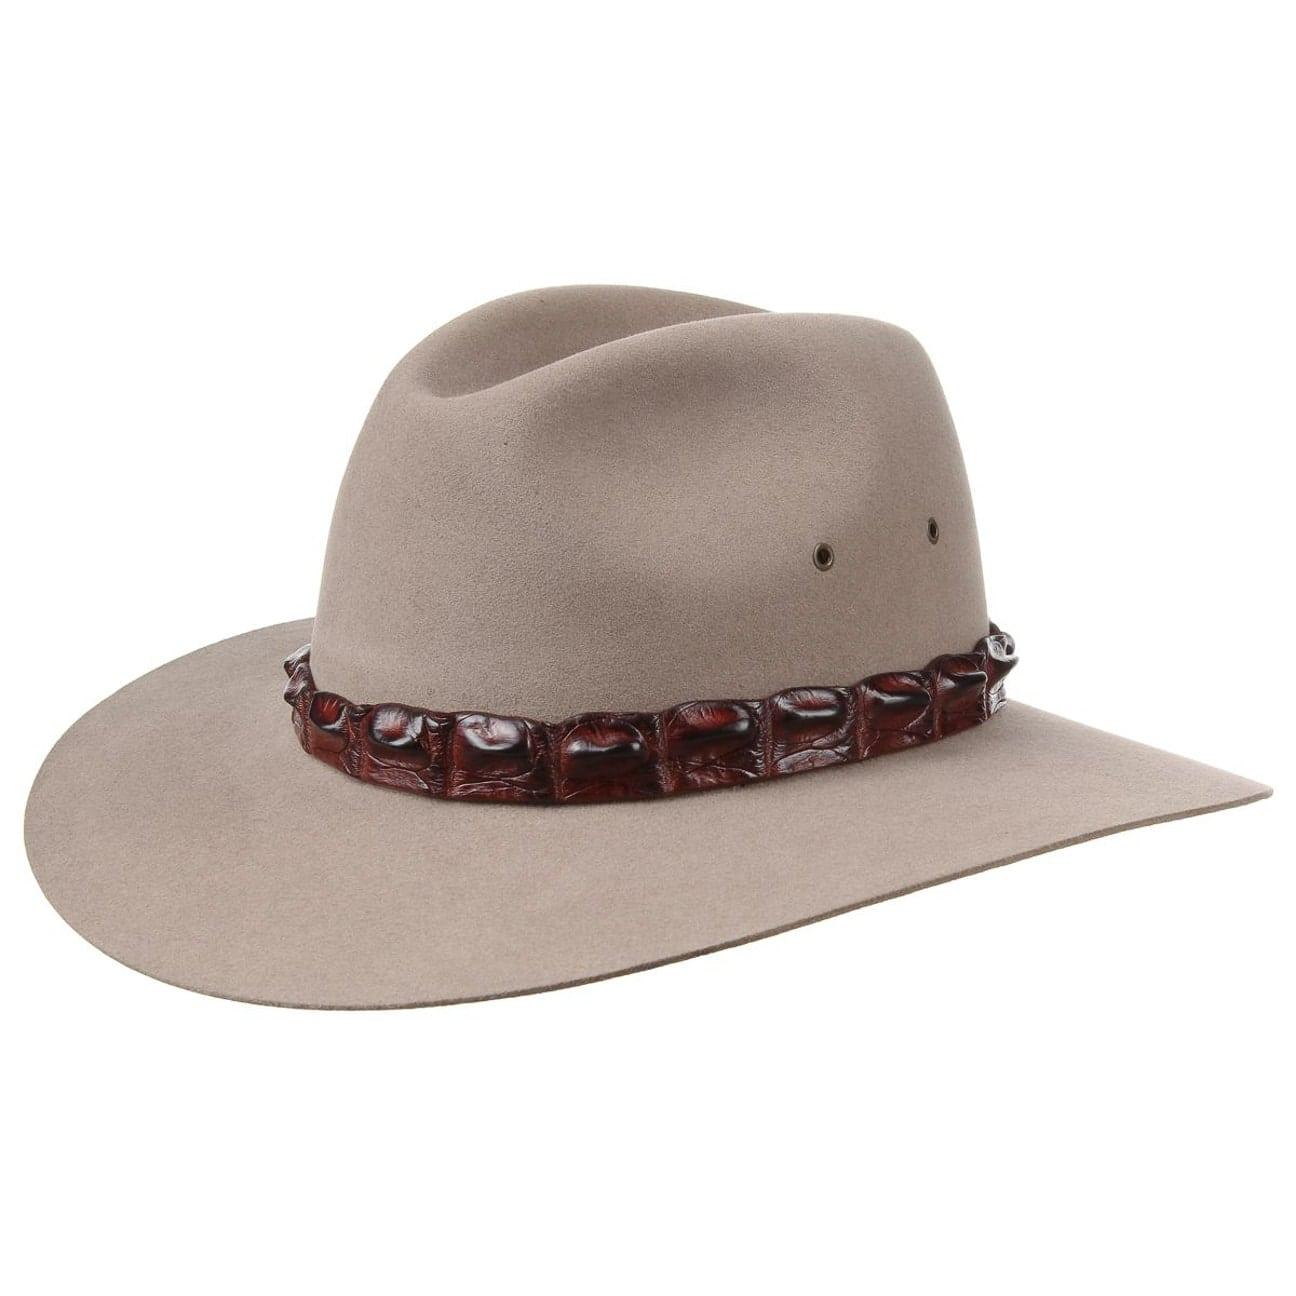 Sombrero Fieltro Pelo Coolabah by Akubra  sombrero de fieltro